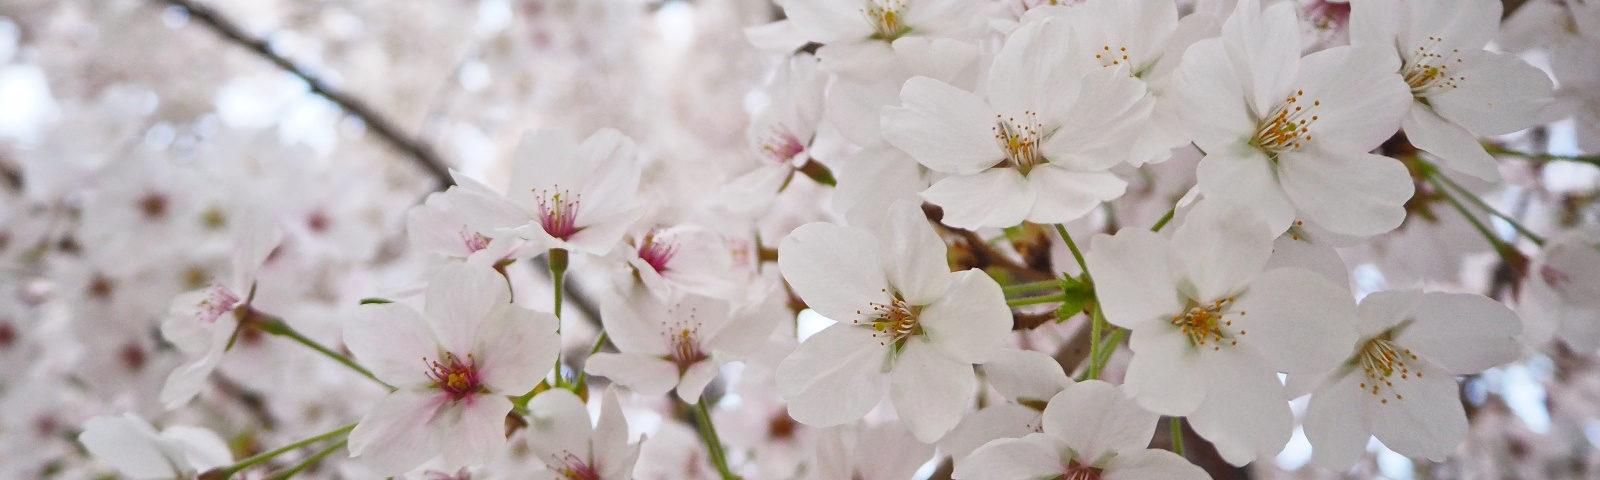 Weltreise 2020 Suedkorea Soeul Kirschbluete cherry blossom